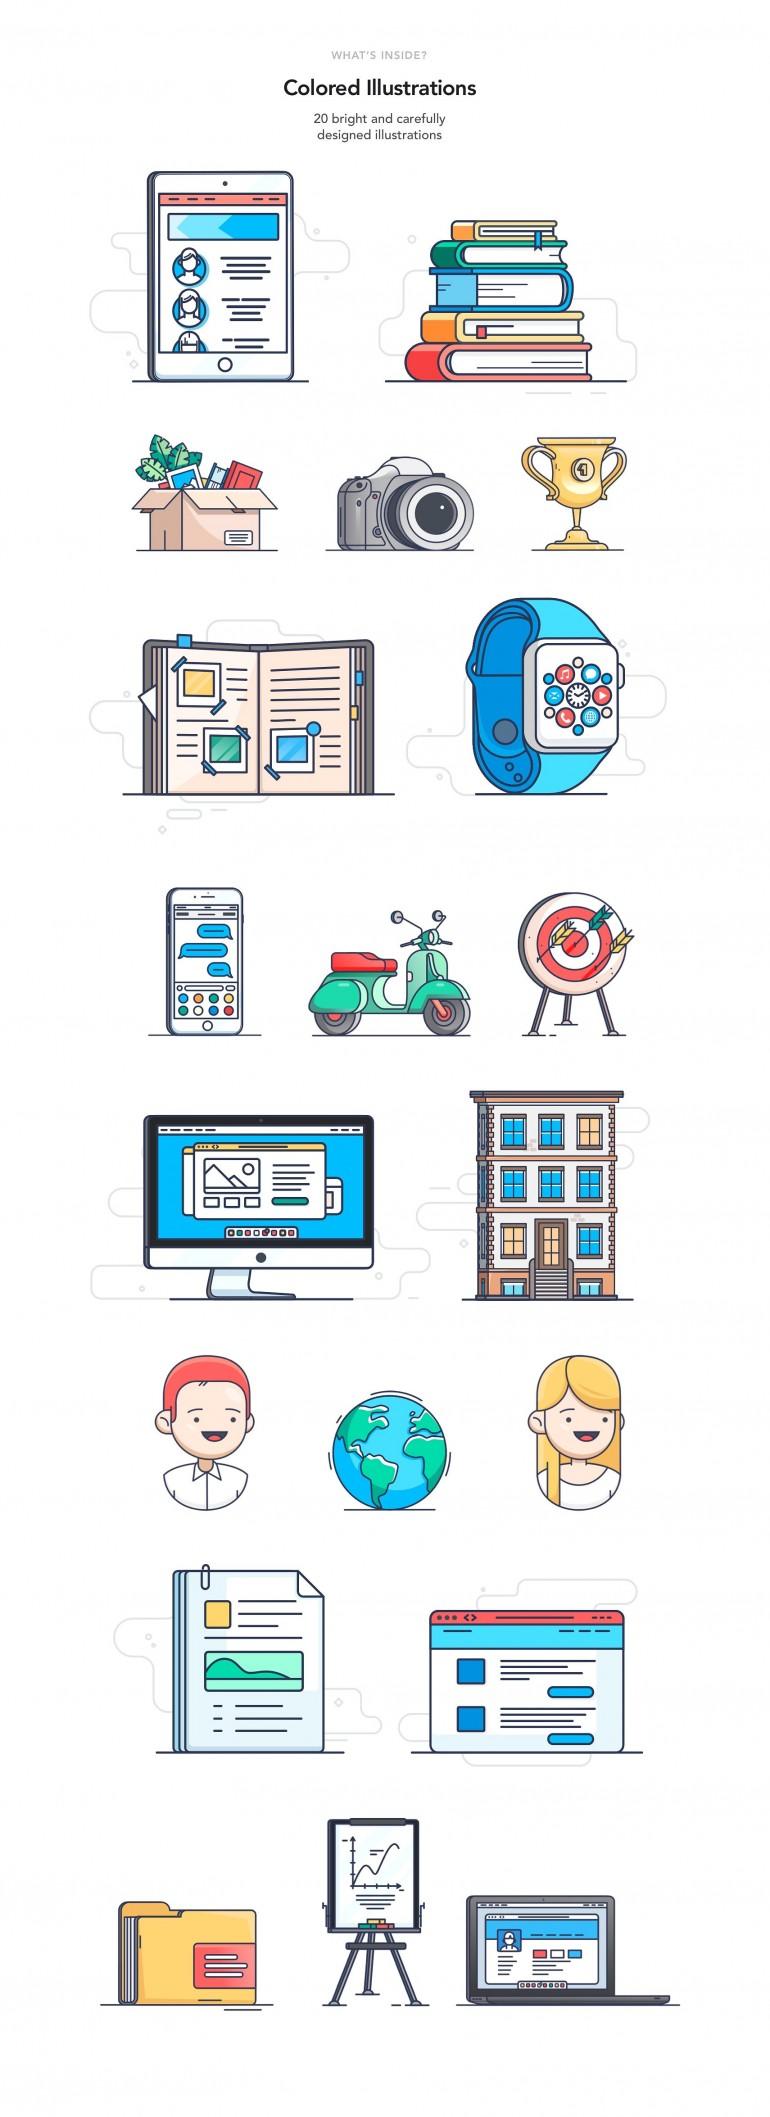 Juicy Illustrations